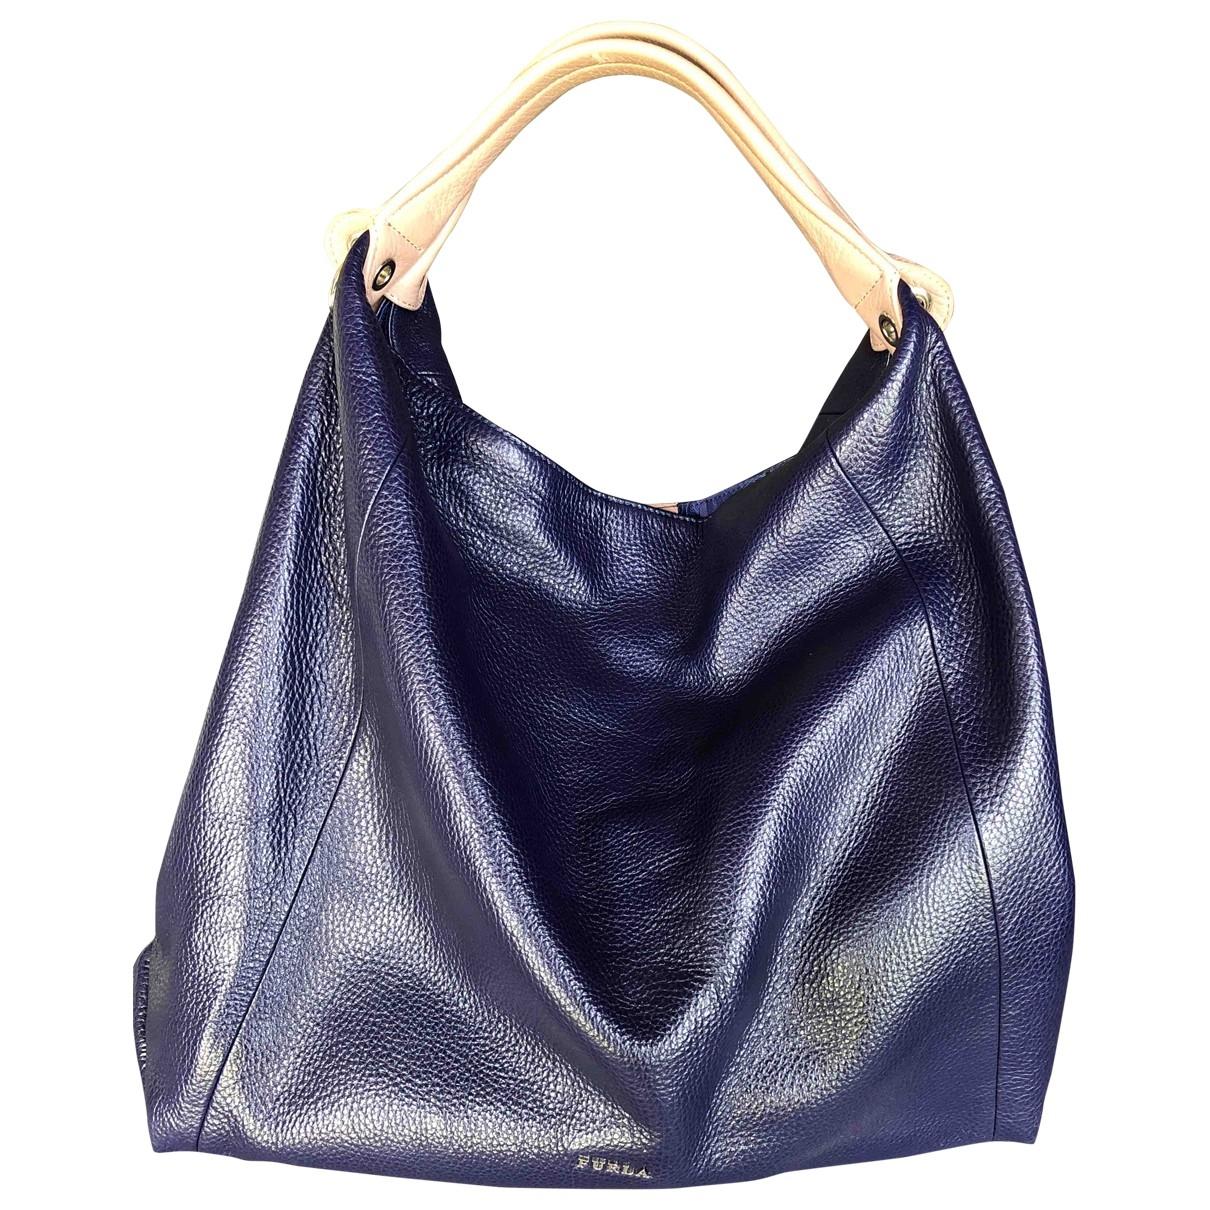 Furla \N Handtasche in  Blau Leder